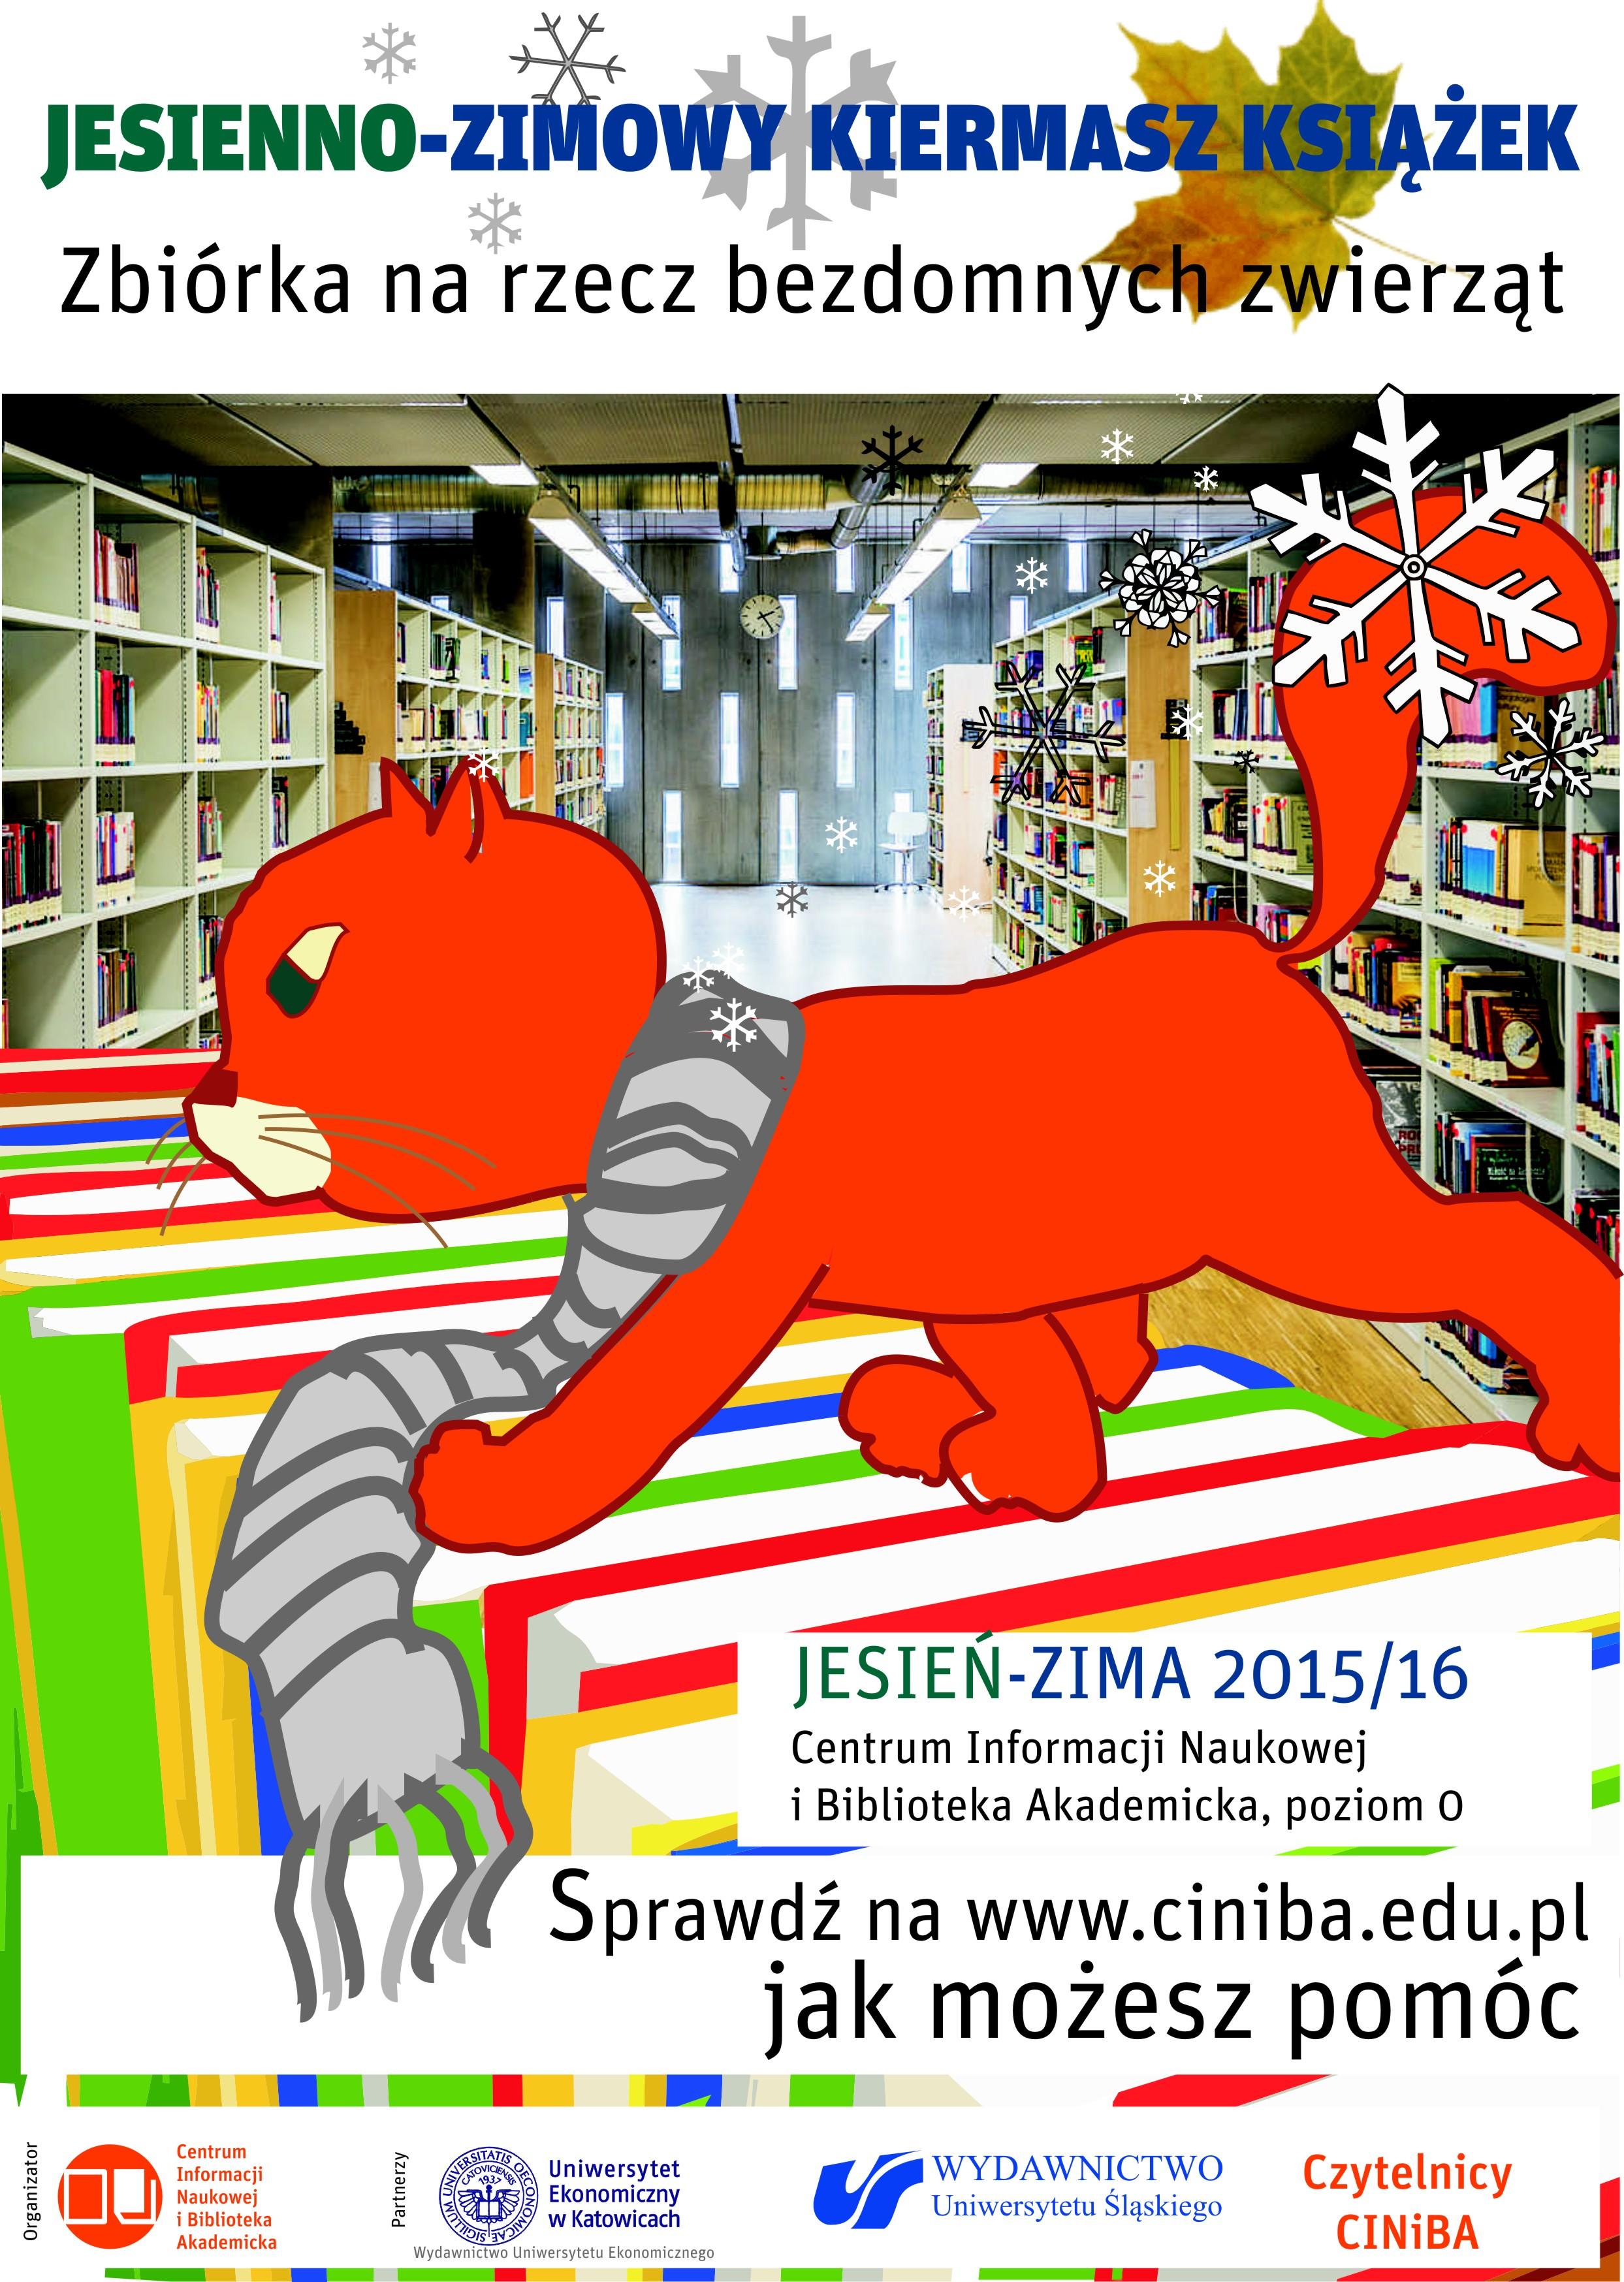 http://www.ciniba.edu.pl/index.php?option=com_content&view=article&id=1292%3Azimowy-kiermasz-ksiek-naukowych&catid=69%3Awiadomoci&Itemid=14&lang=pl